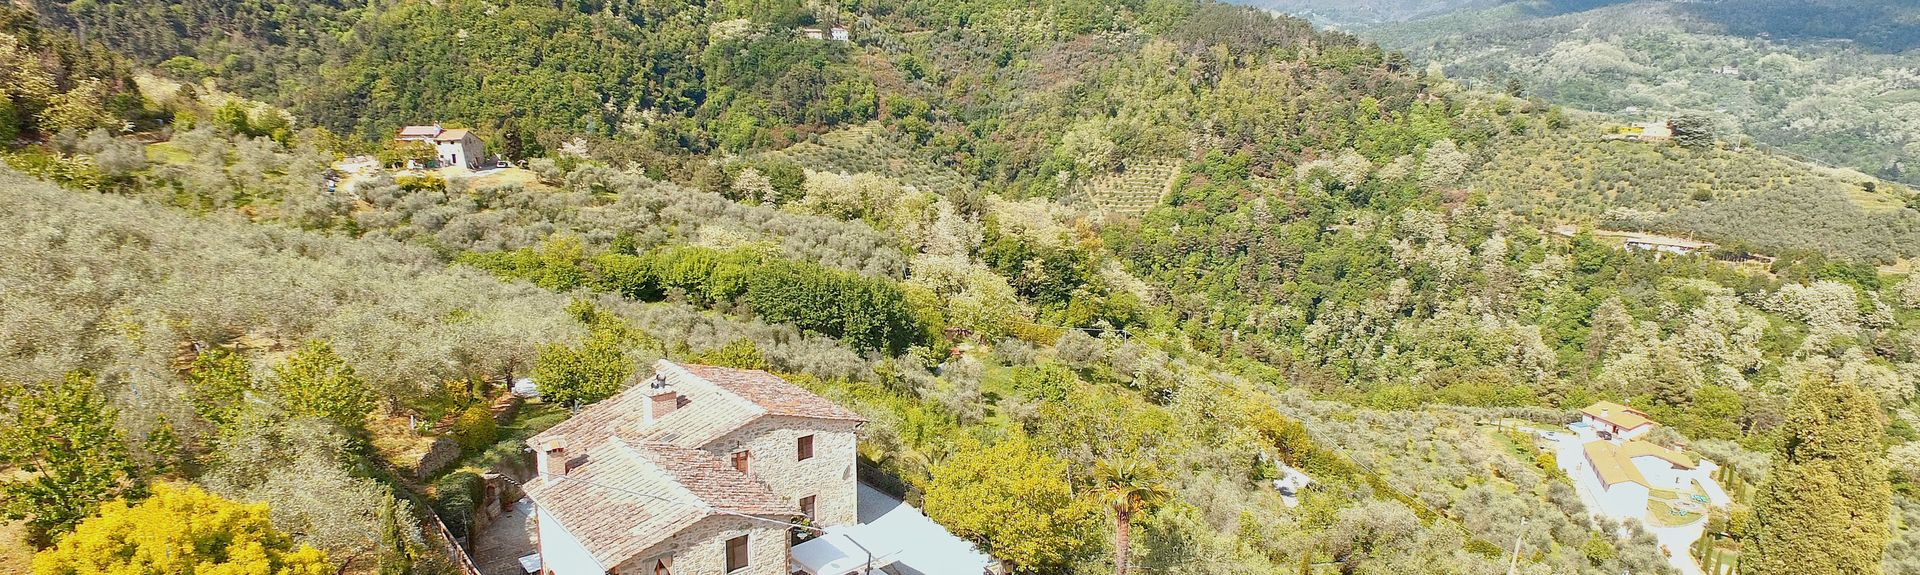 Sant'Andrea, Pistoia, Toscana, Italia